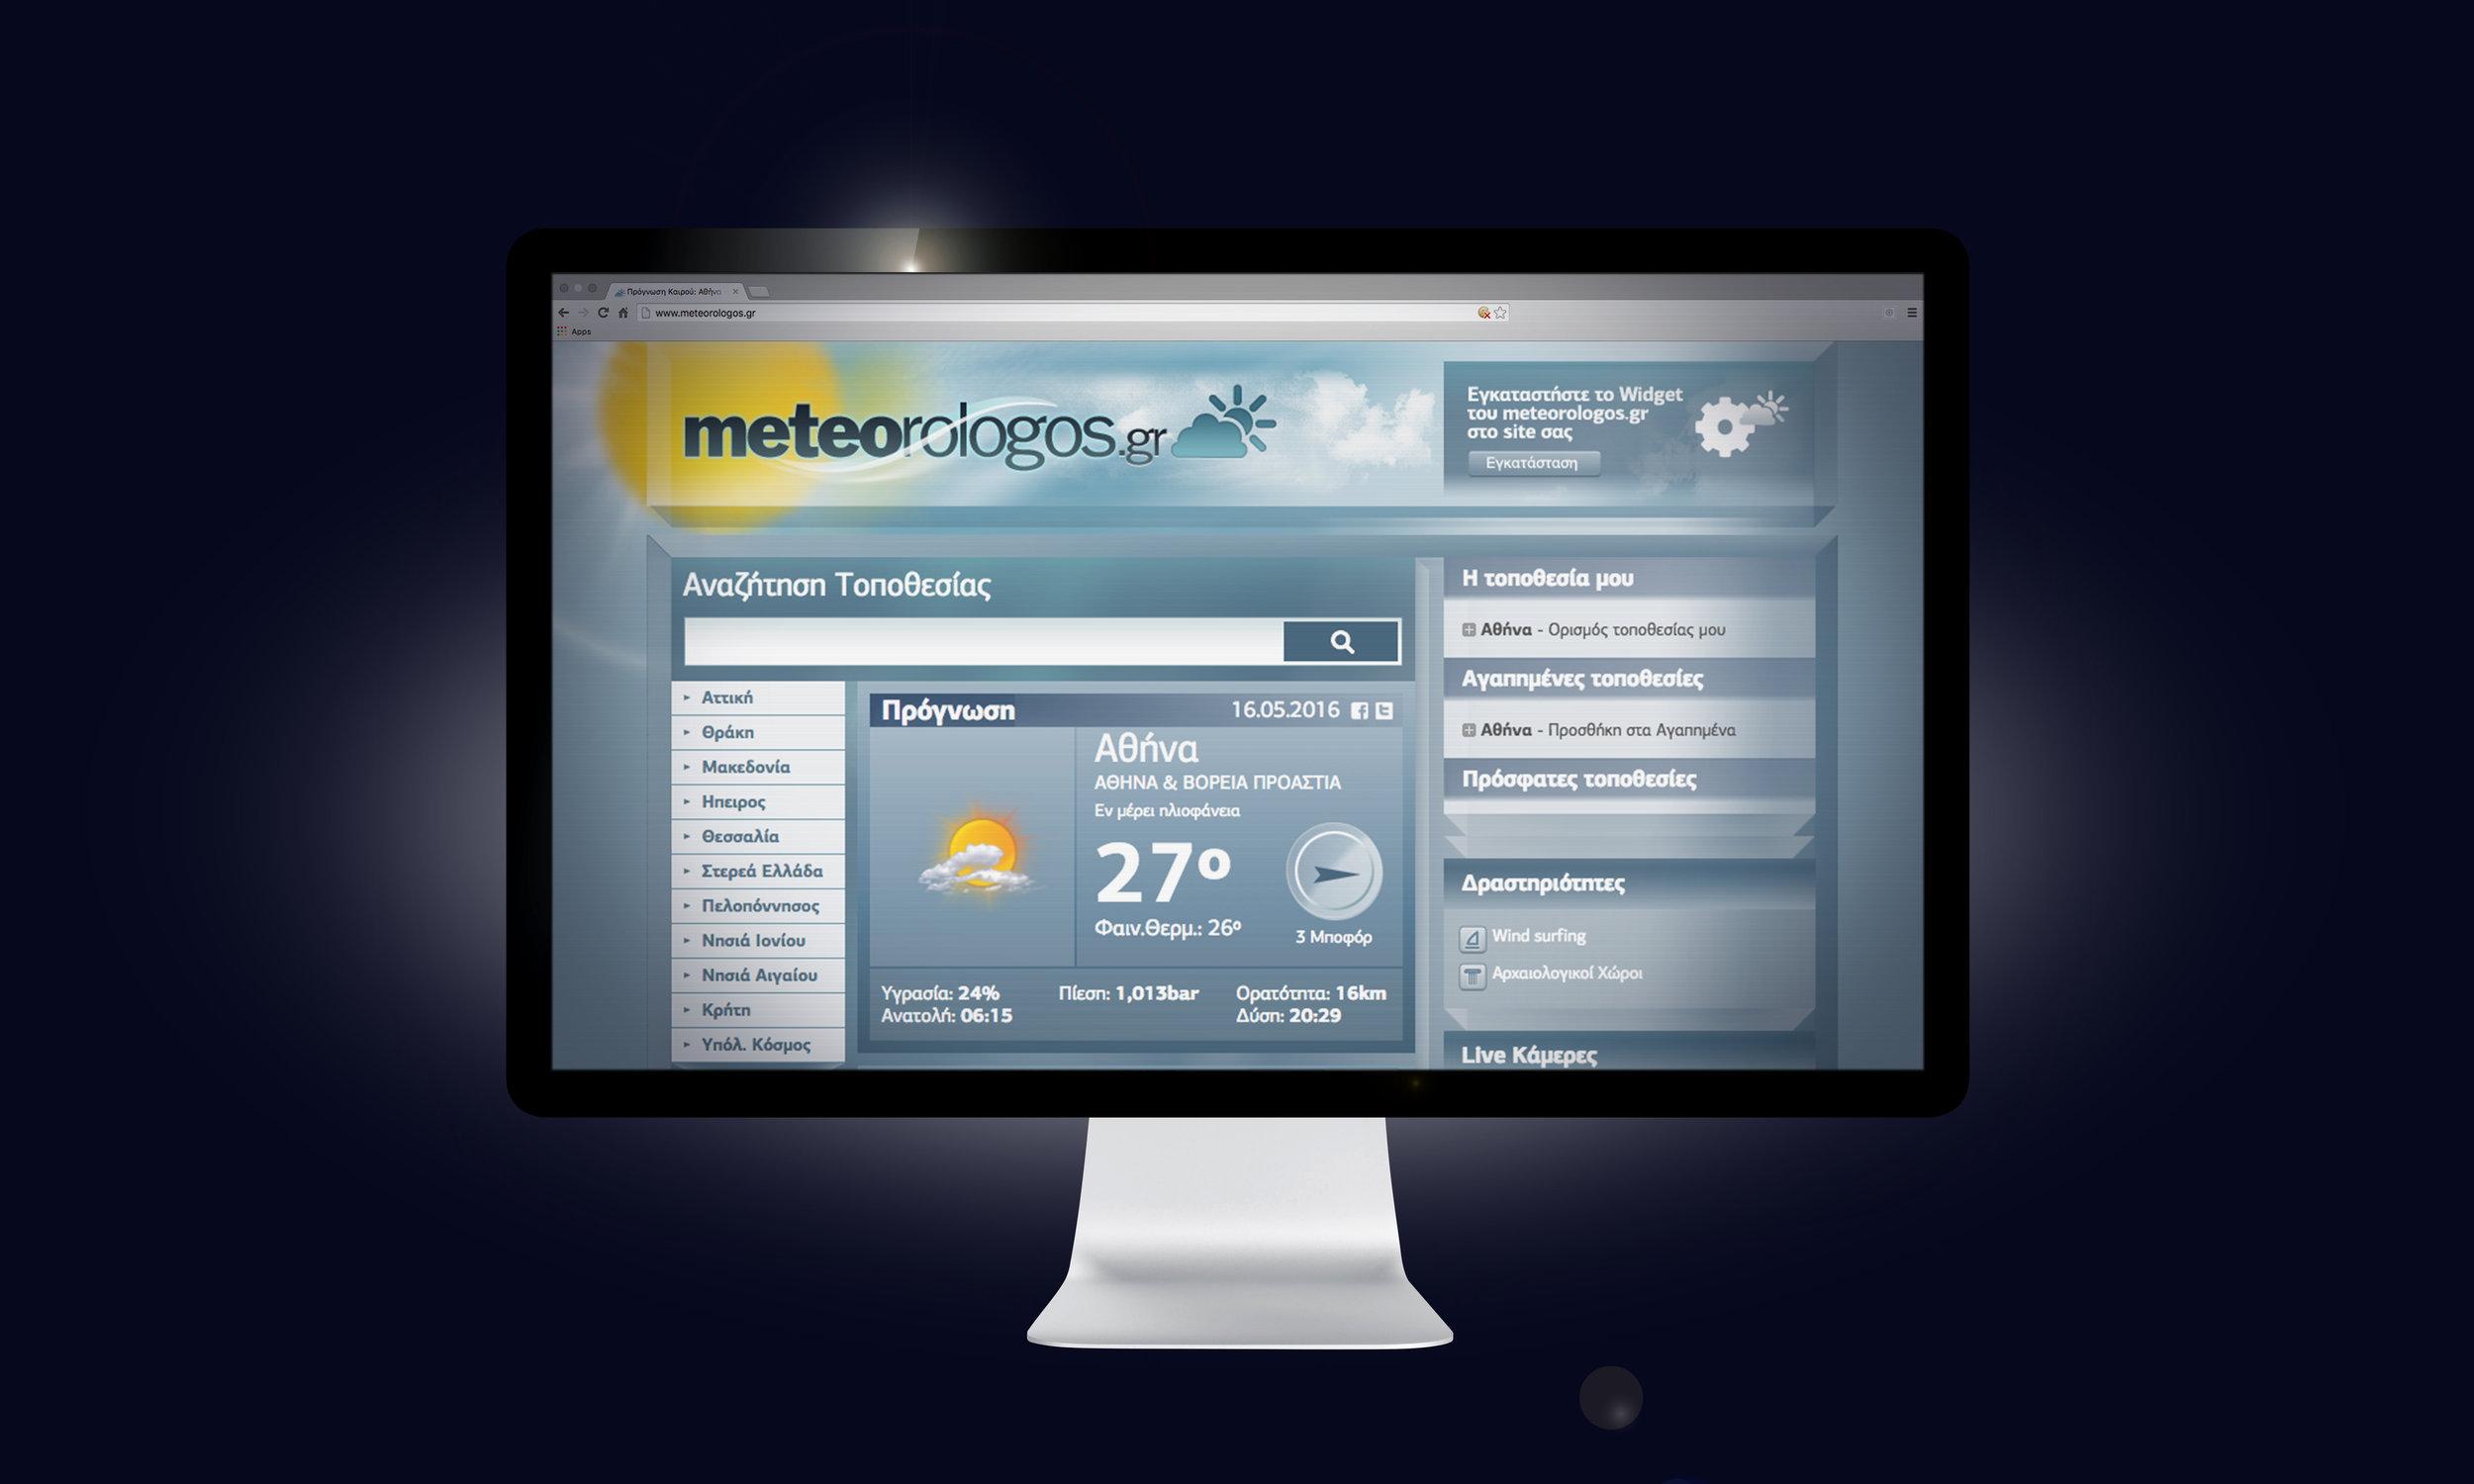 "<a href=""http://www.meteorologos.gr/"" target=""_blank"">meteorologos.gr</a>"